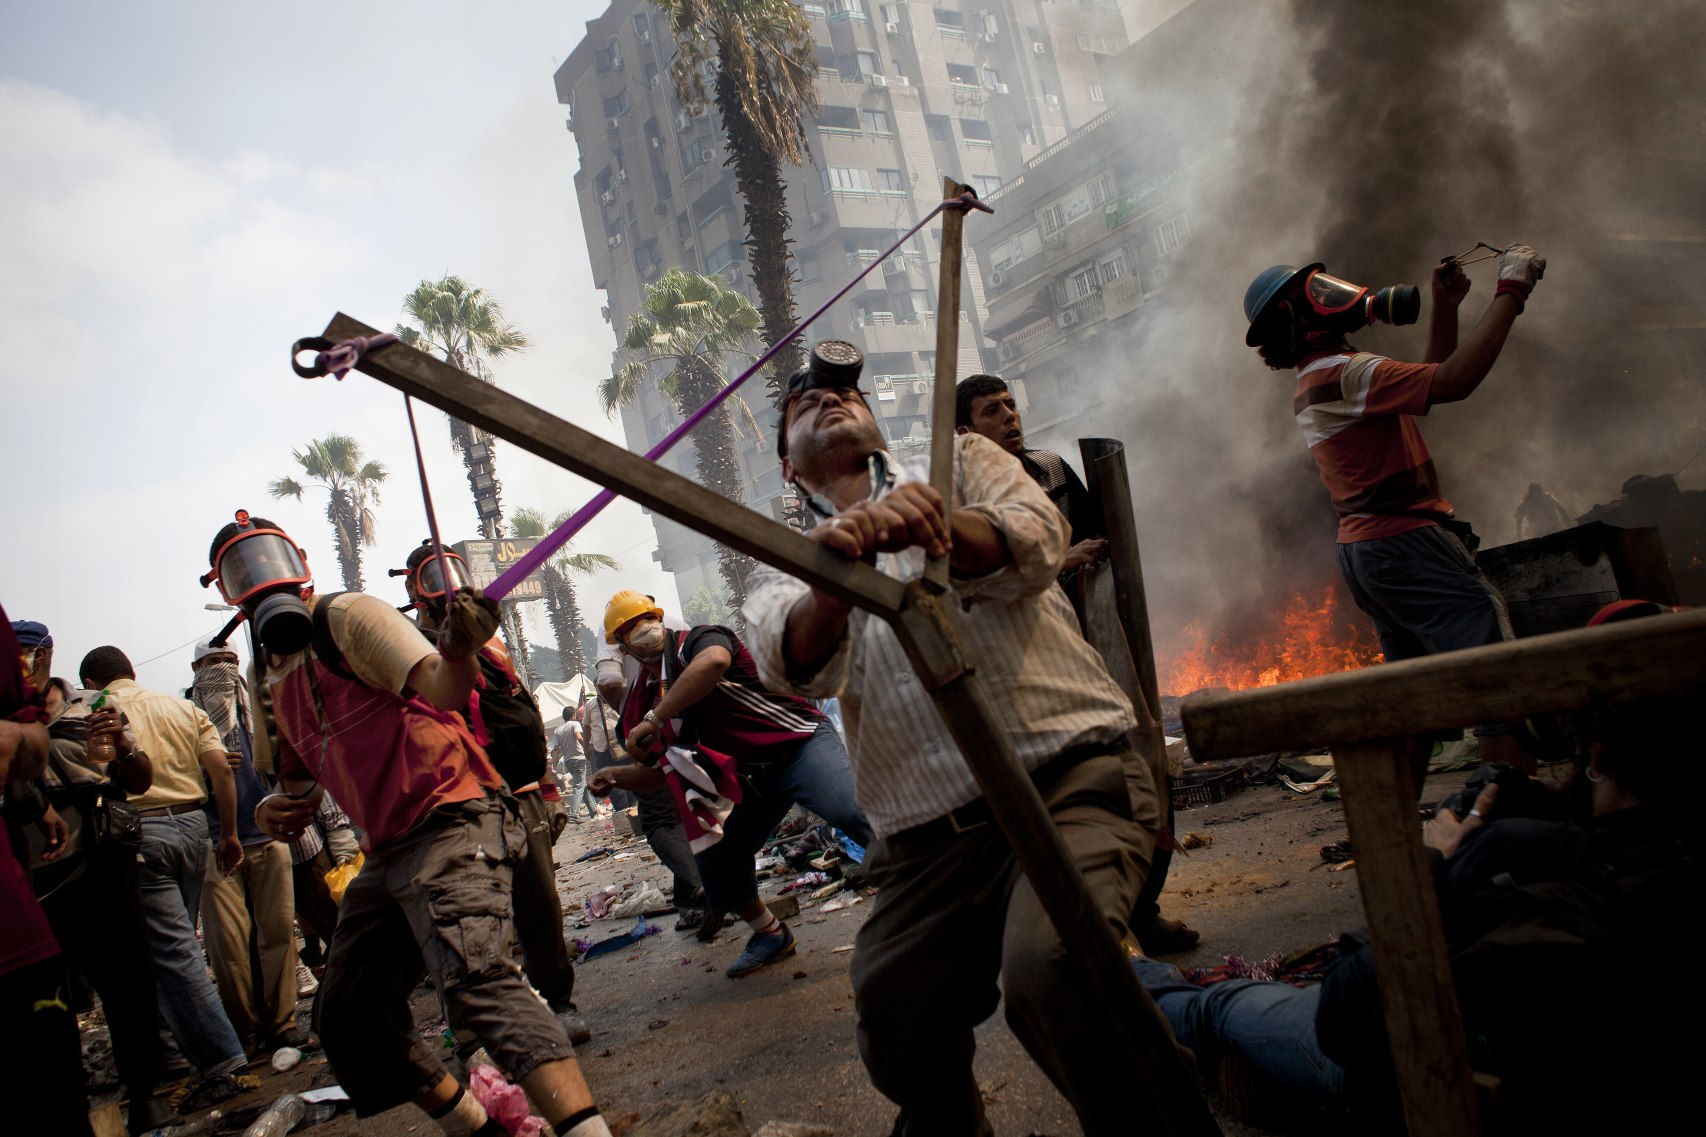 Dos hombres con un gran tirachinas en el Cairo.